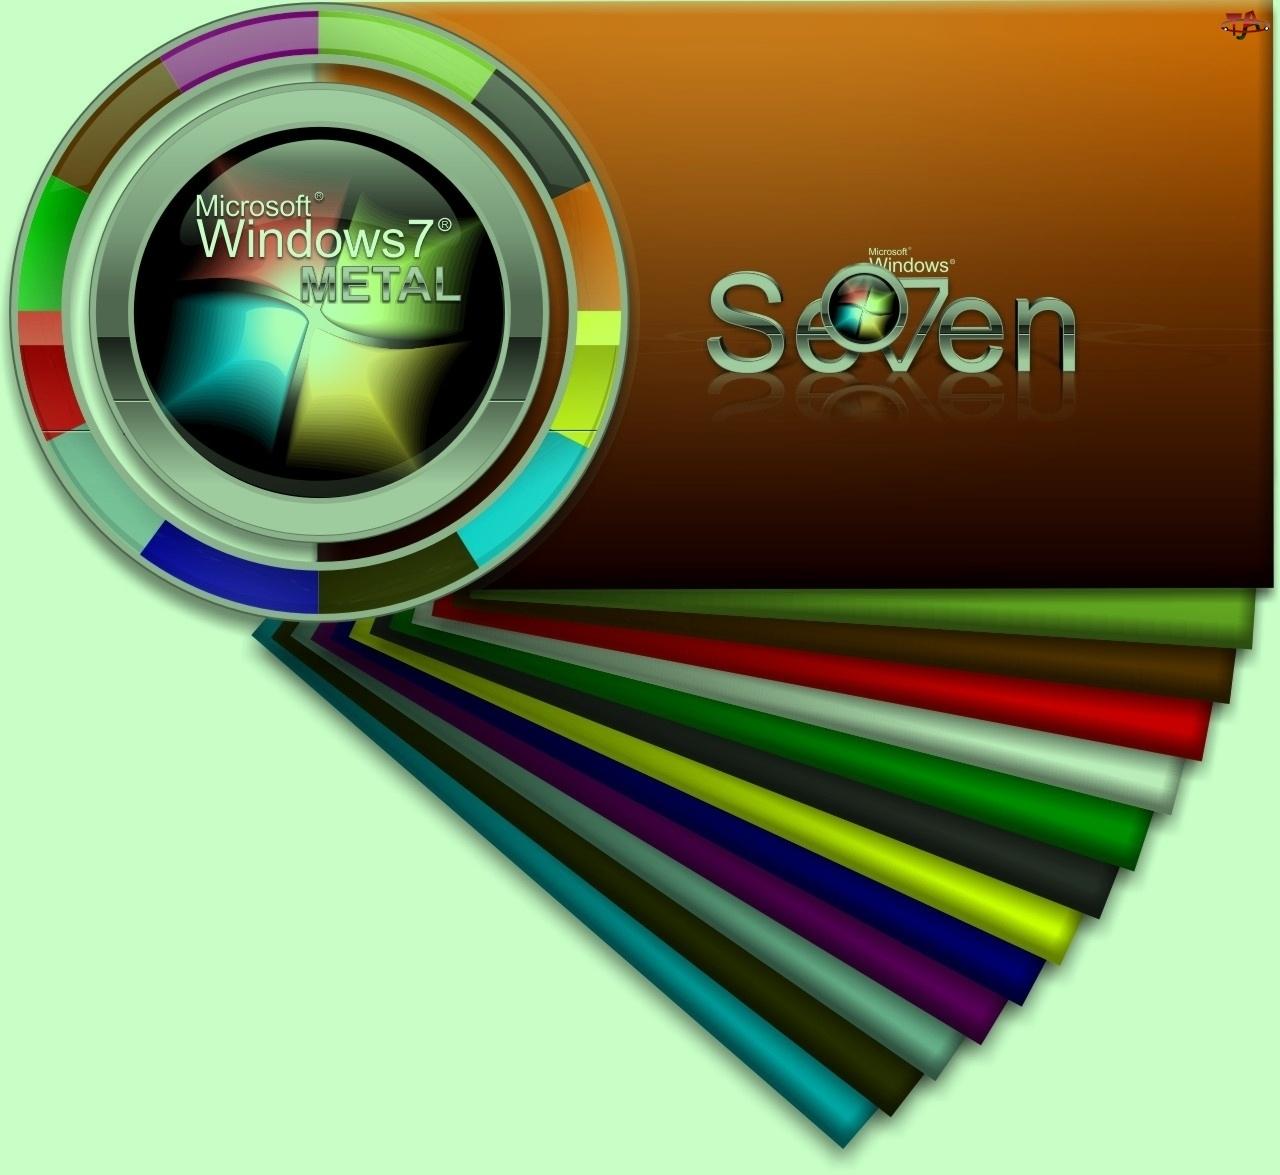 Tapeta, Windows Seven, Systemu, Operacyjnego